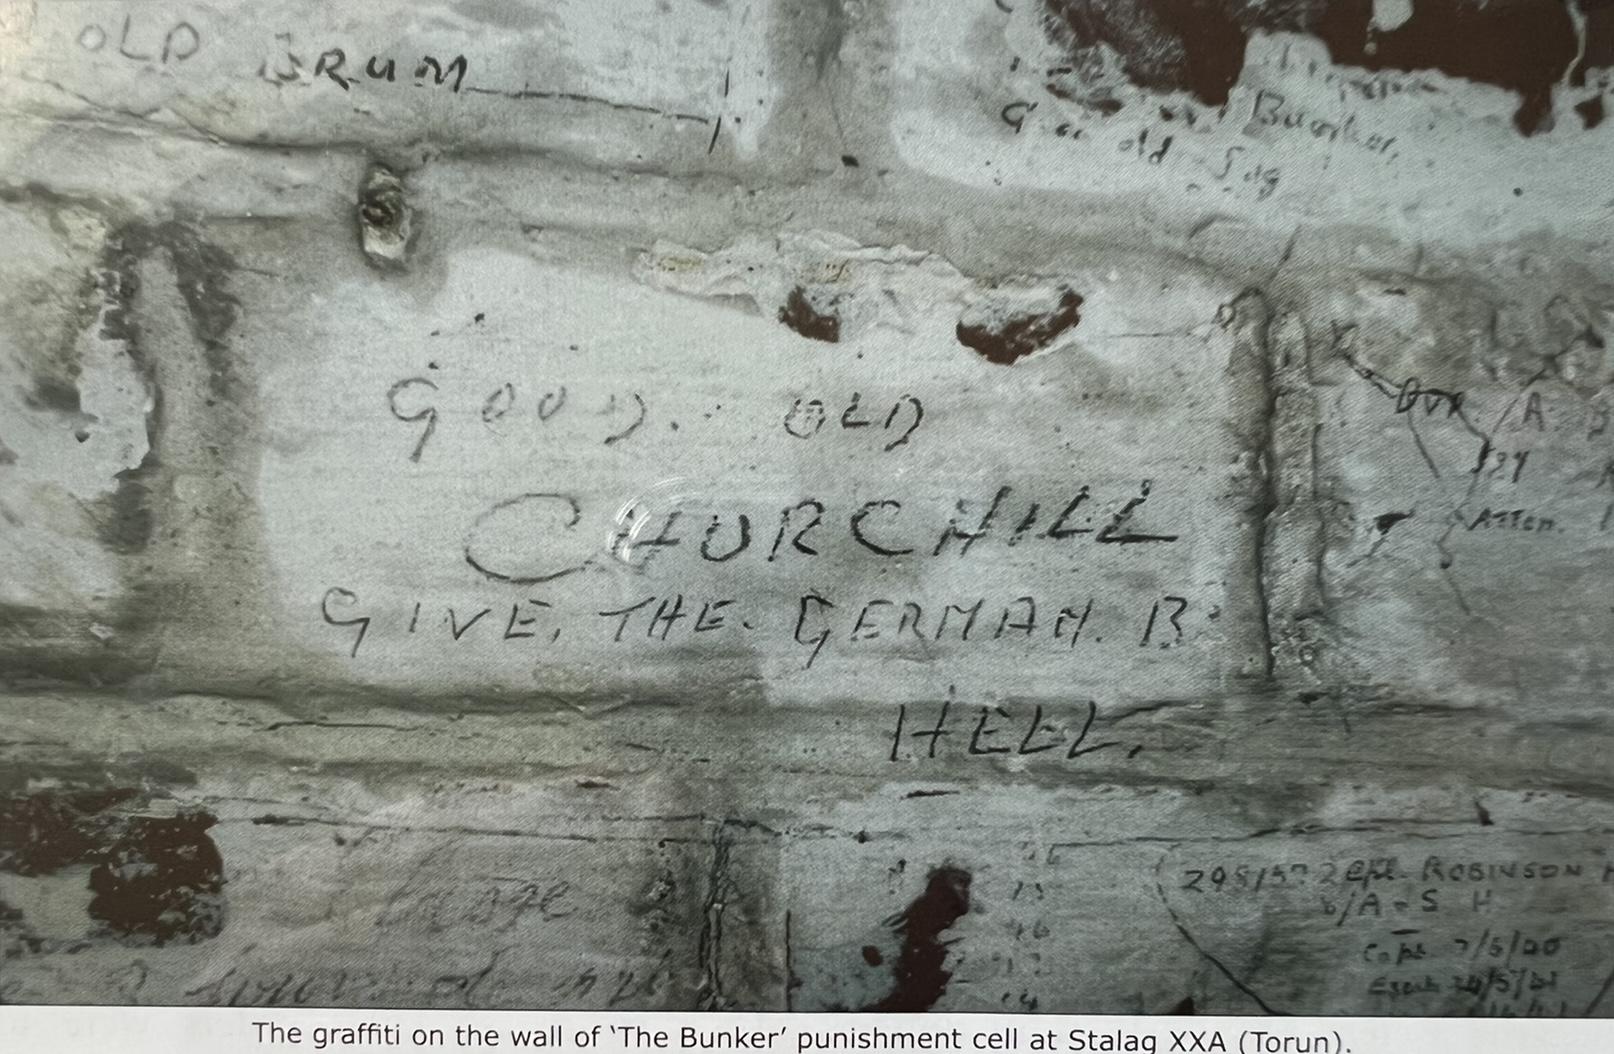 POW graffiti on wall at Stalag XXA